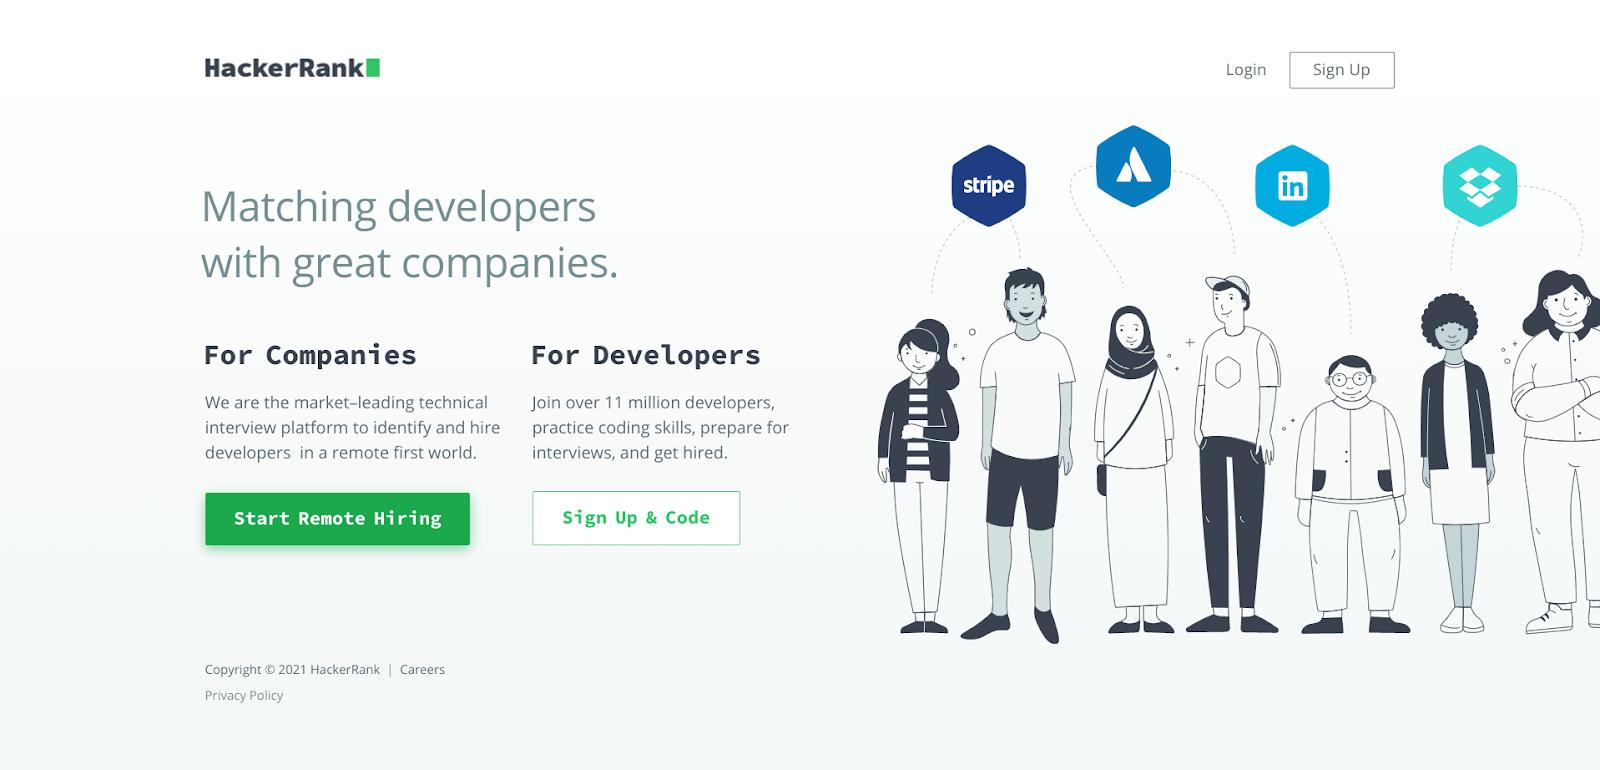 hackerrank vs leetcode vs toggl hire - hackerrank